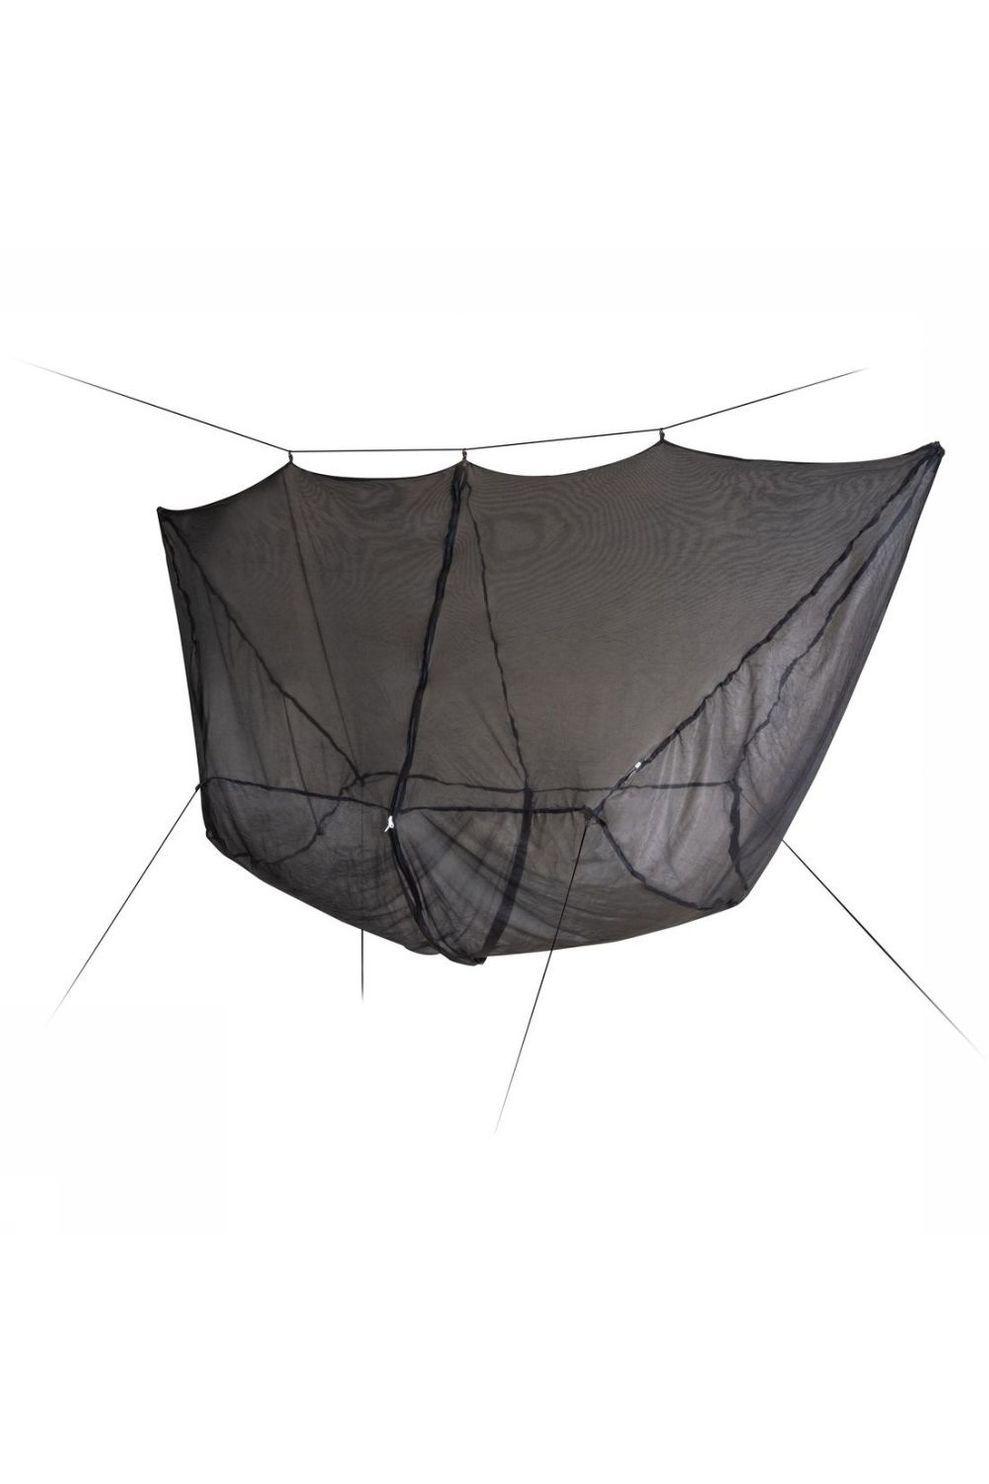 La Siesta Hangmat Bugnet - Zwart